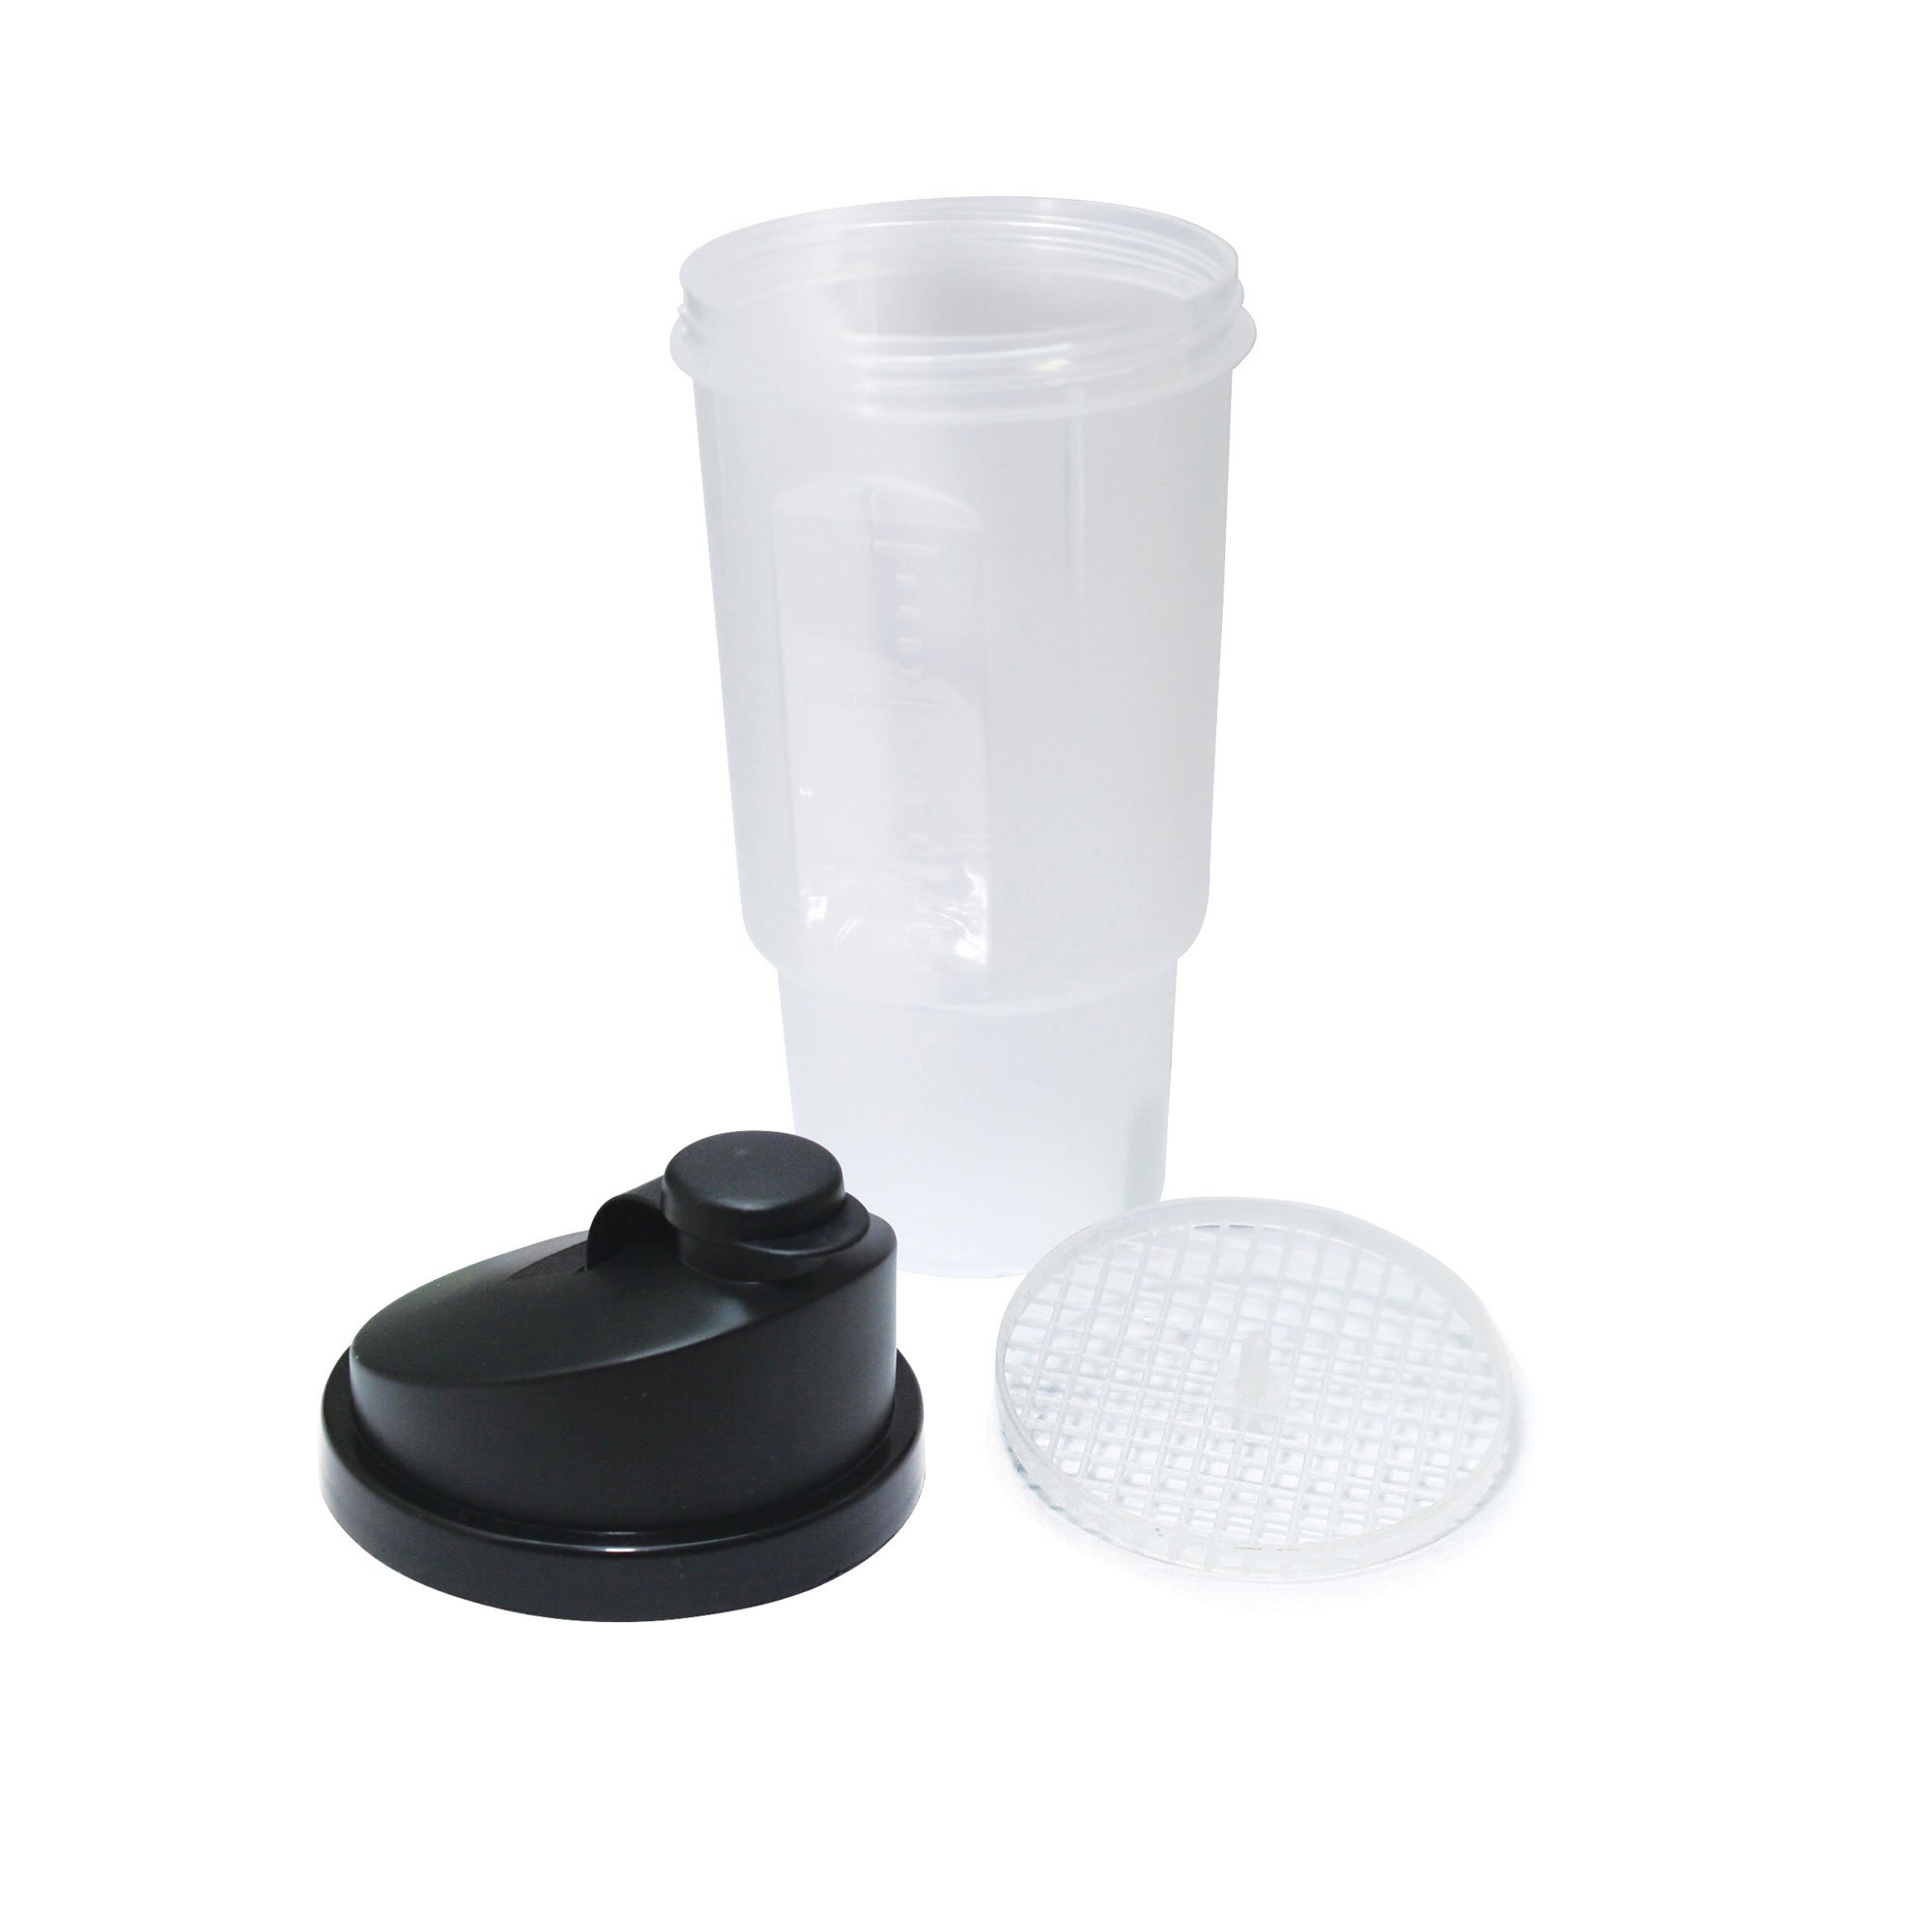 NuFazes 20 Oz Protein Shaker - 1 Pack